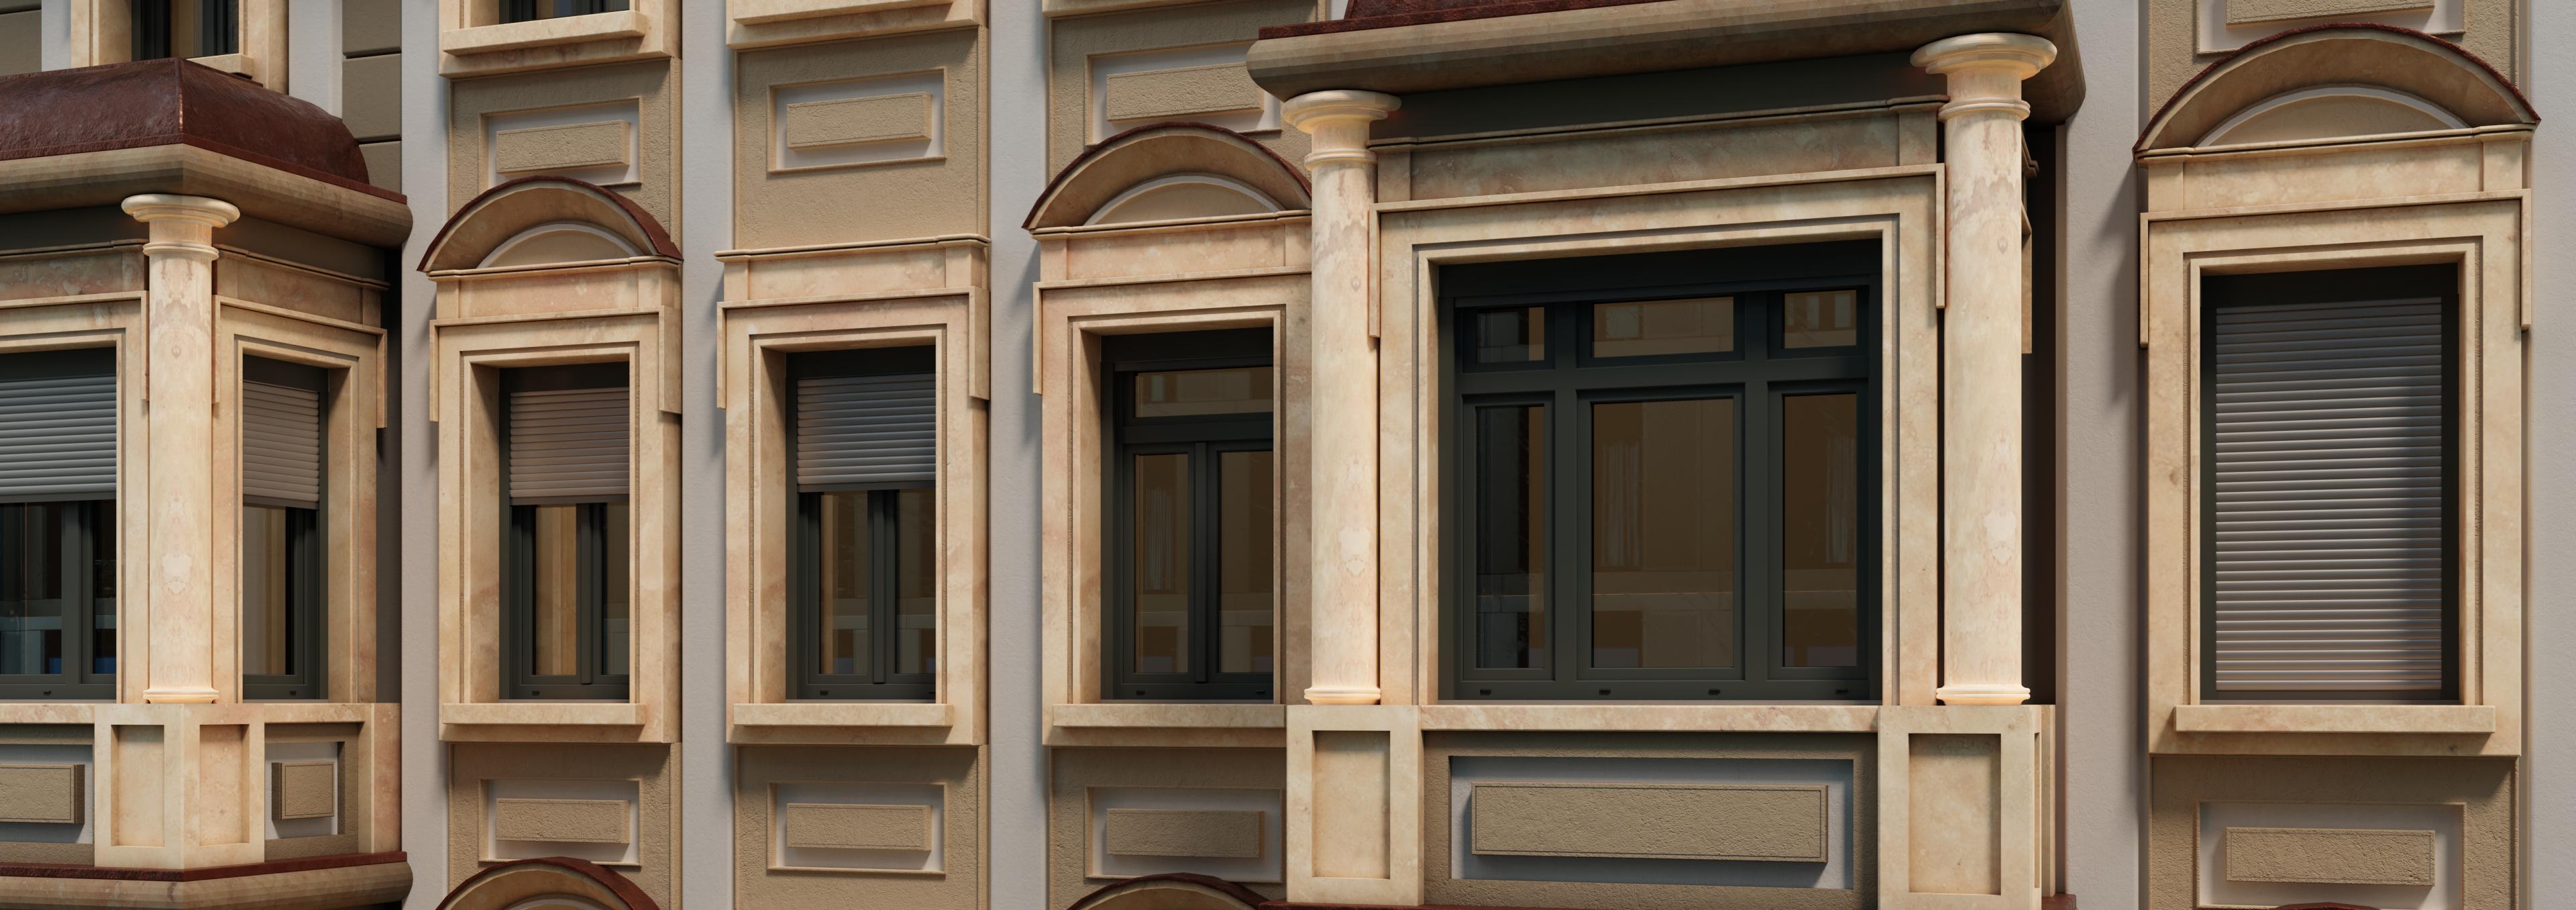 Full Size of Fenster Mit Rolladen Smart Fensterwunder Integrierter Rollladen Blaurock Küche Elektrogeräten Günstig Kaufen Bett Gästebett Obi Sofa Holzfüßen Fenster Fenster Mit Rolladen